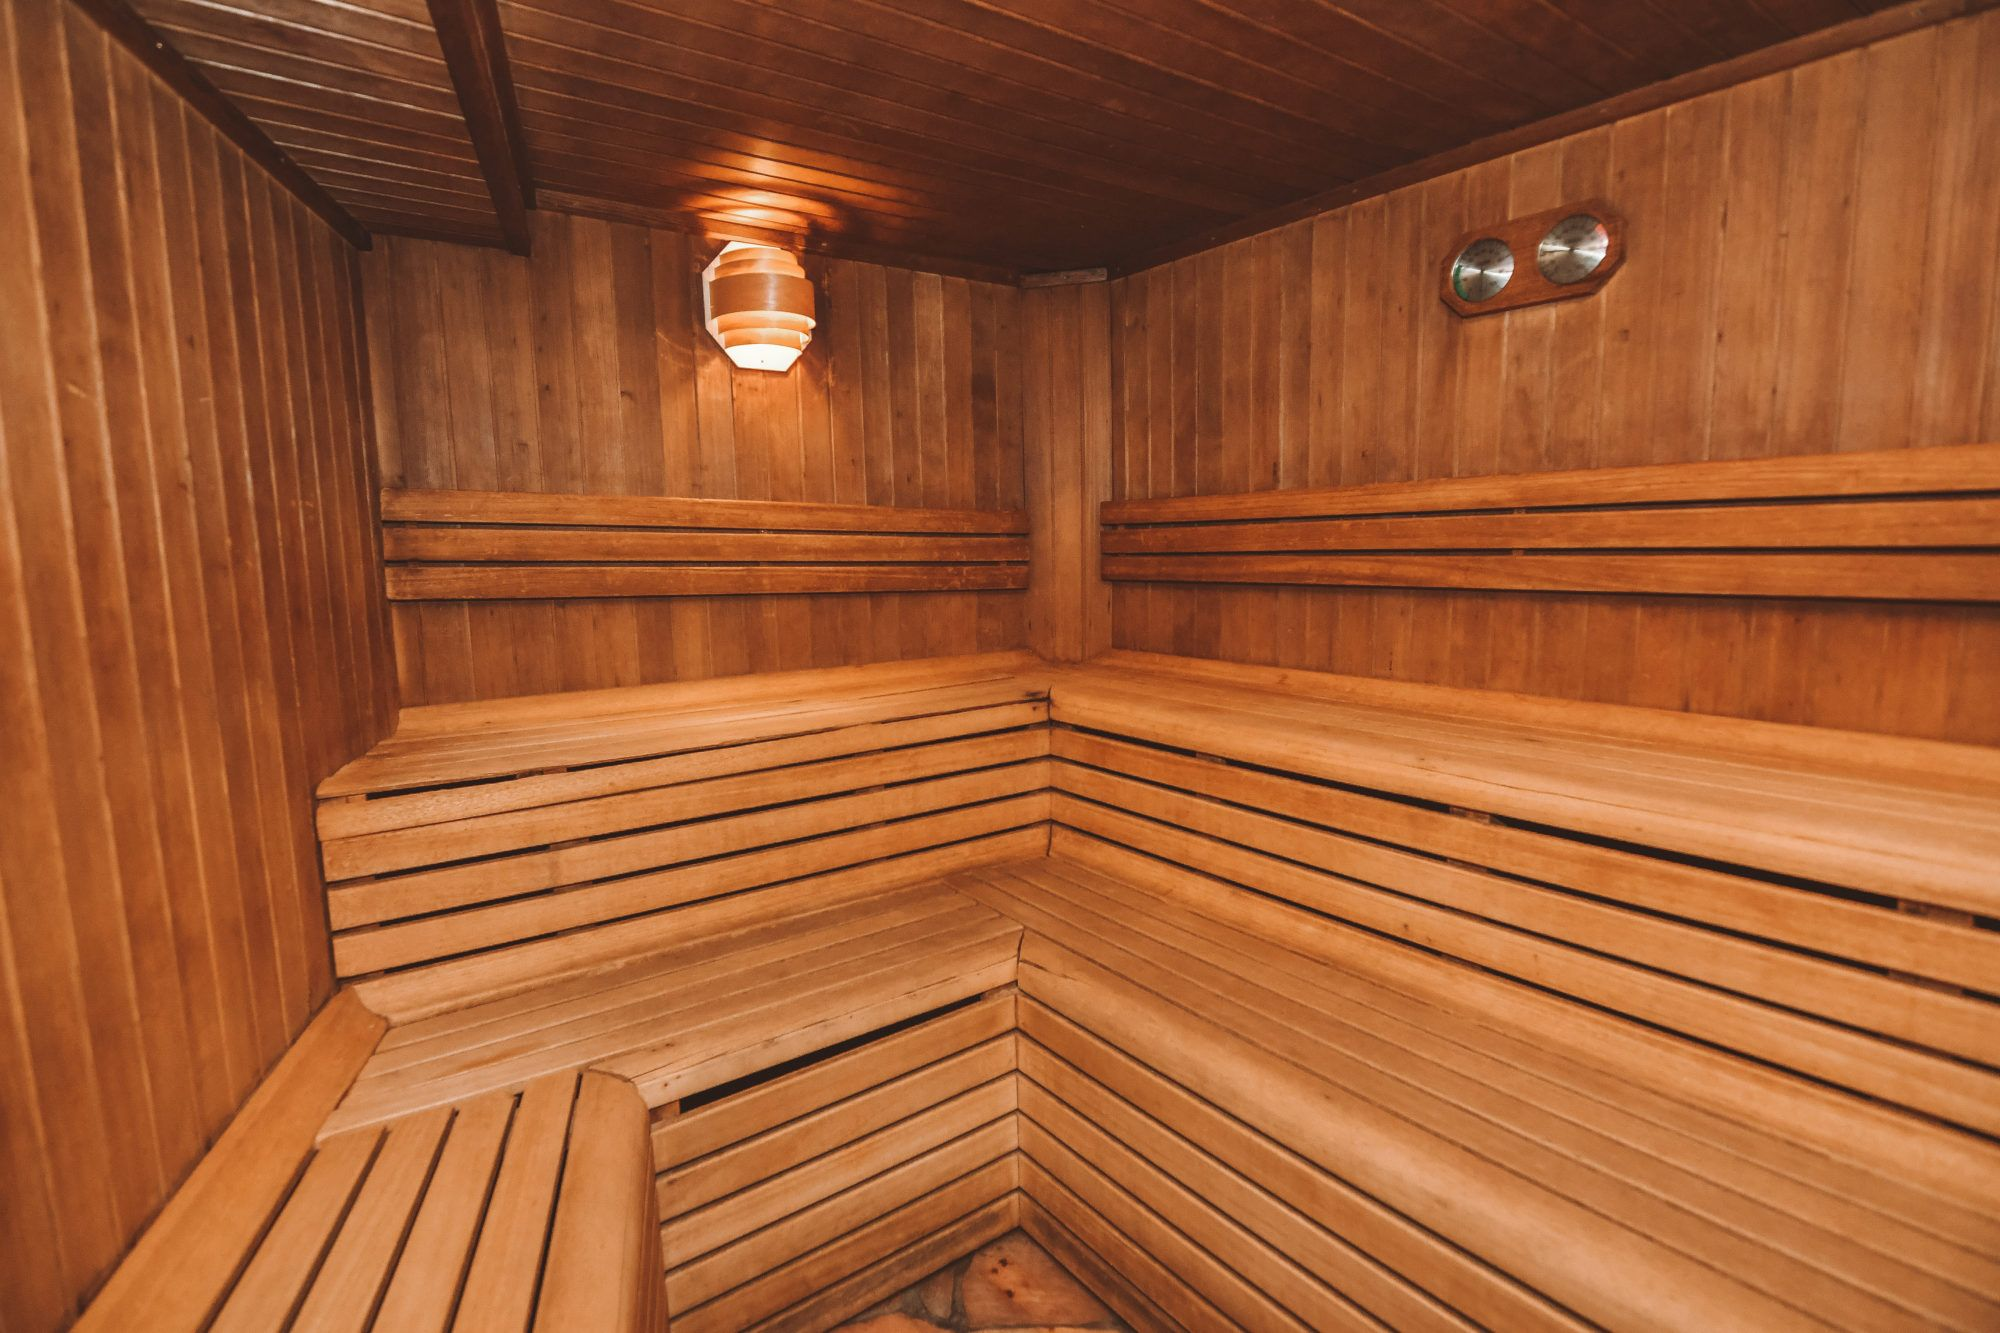 22 Hotel Soreghes - sauna